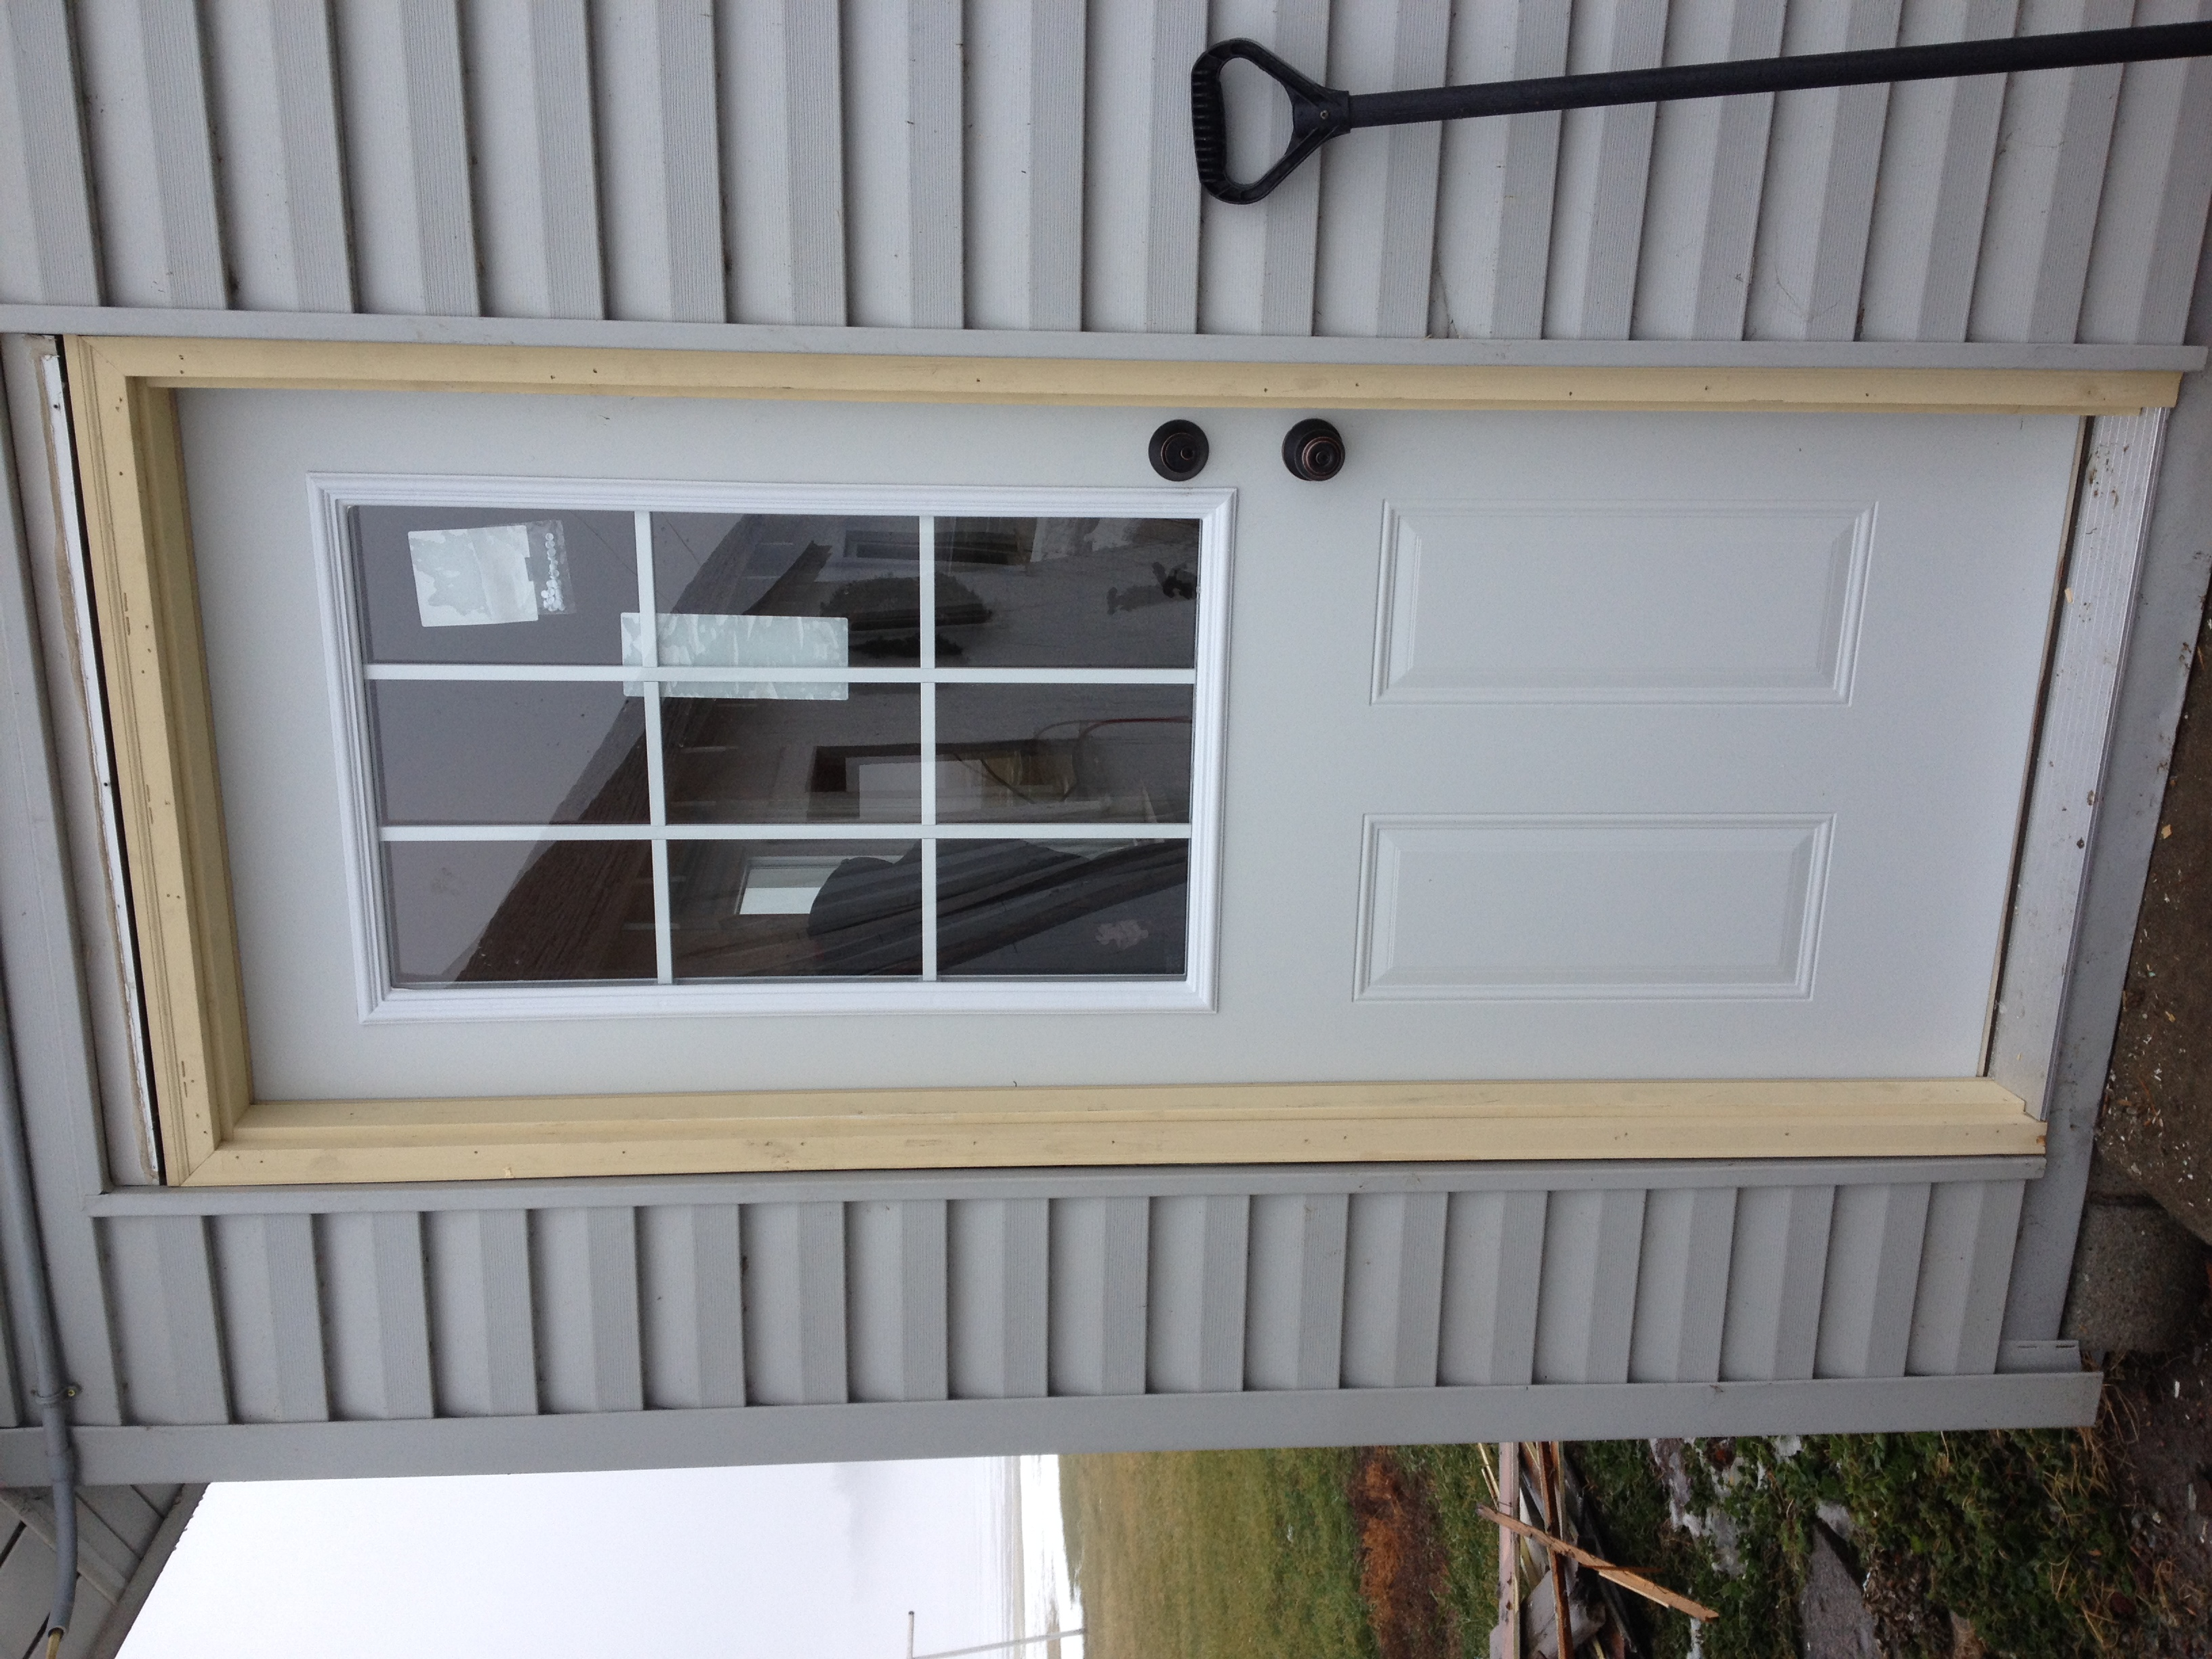 Menards Storm Doors Exterior Examples Ideas Pictures megarct